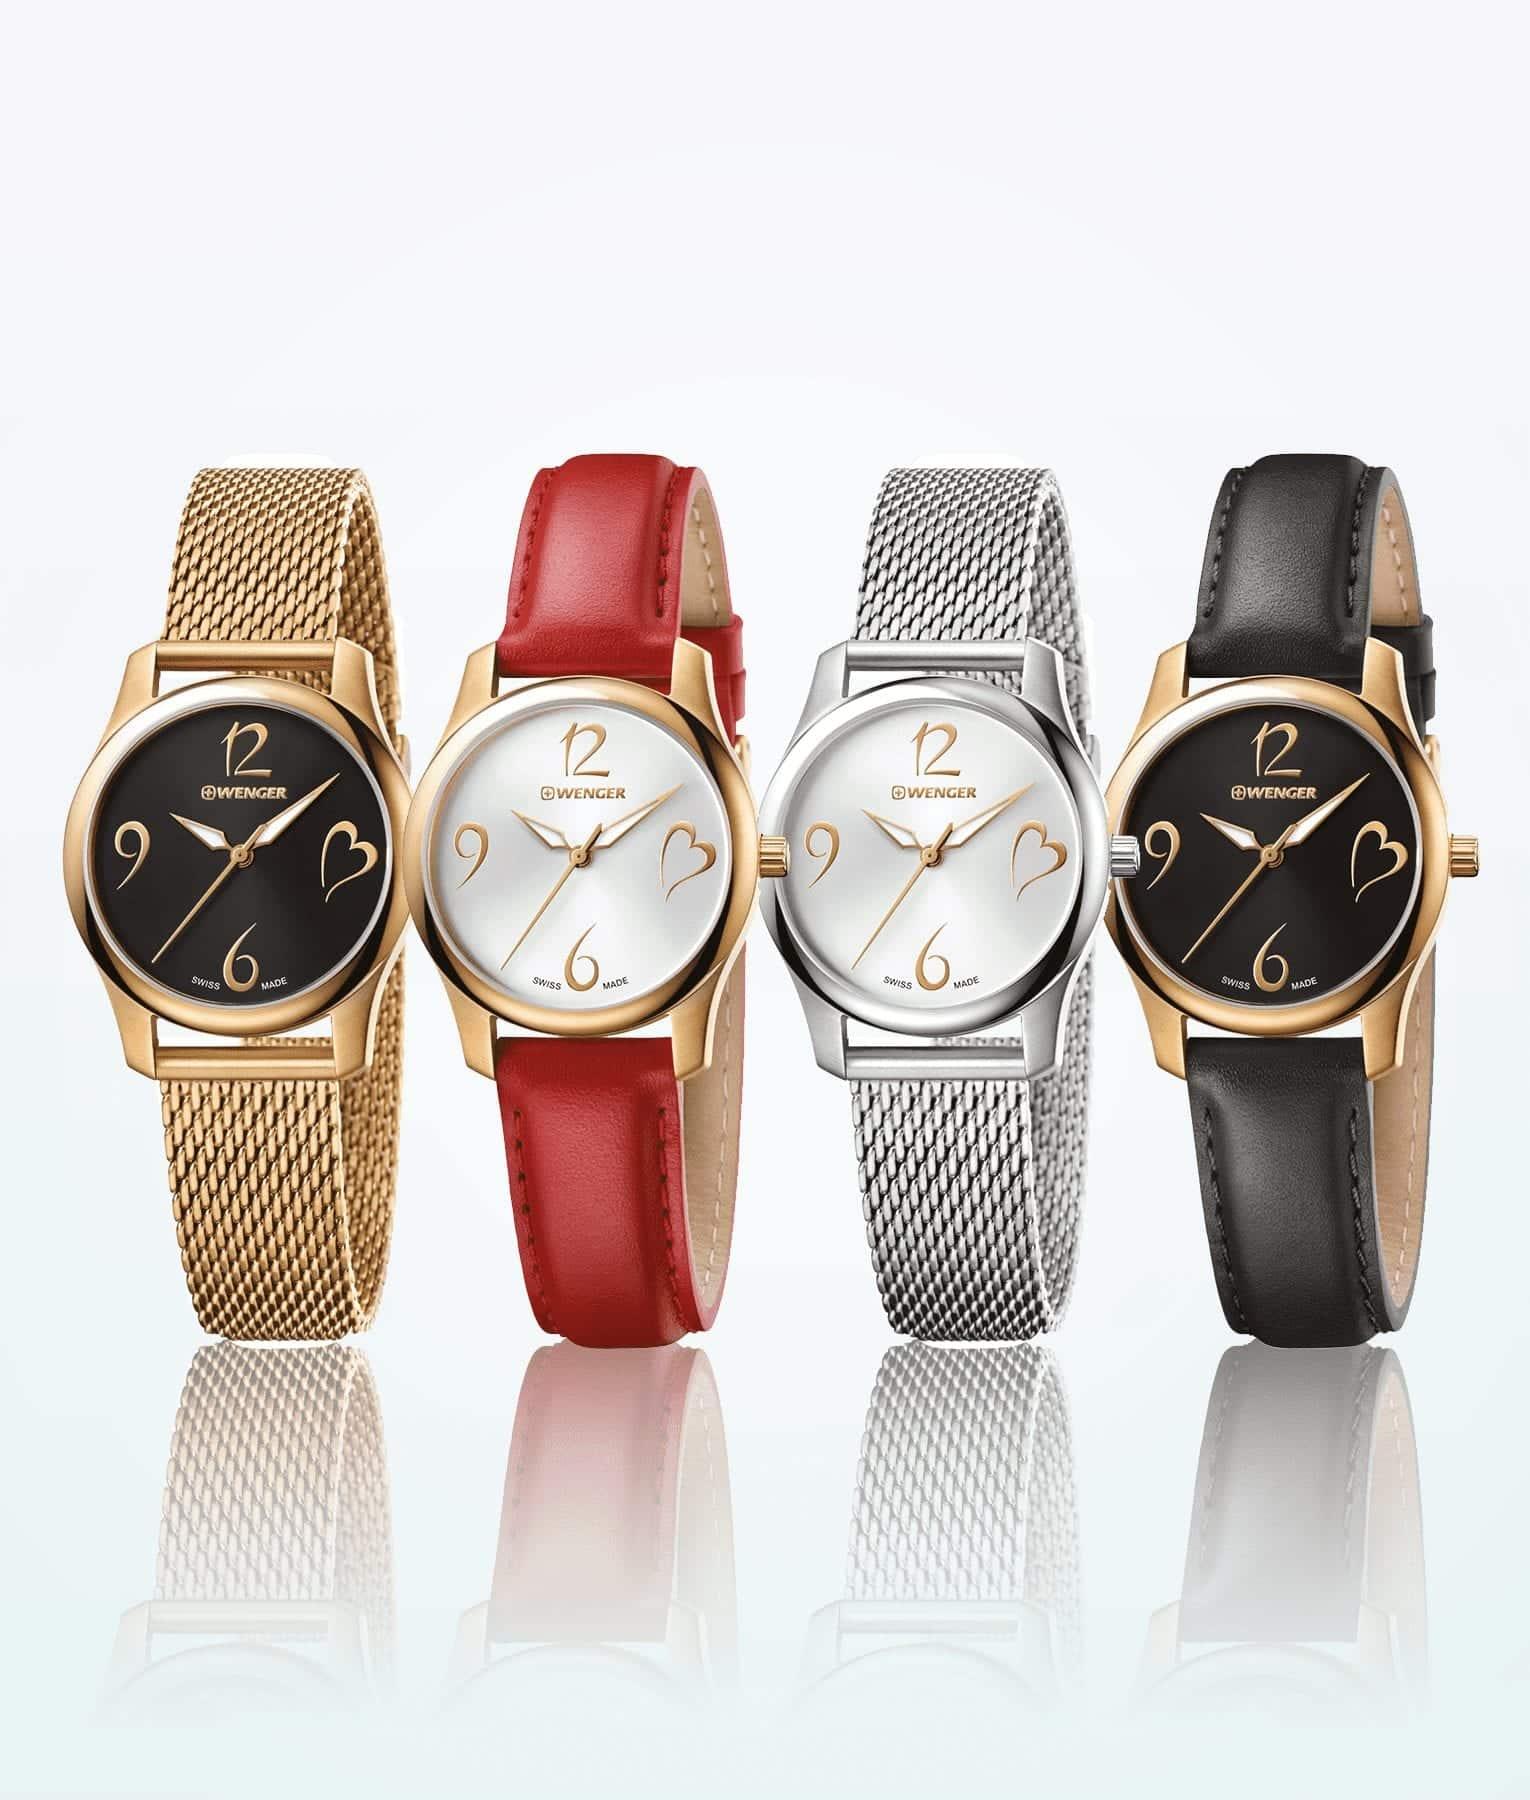 wenger-very-city-lady-women-wristwatch